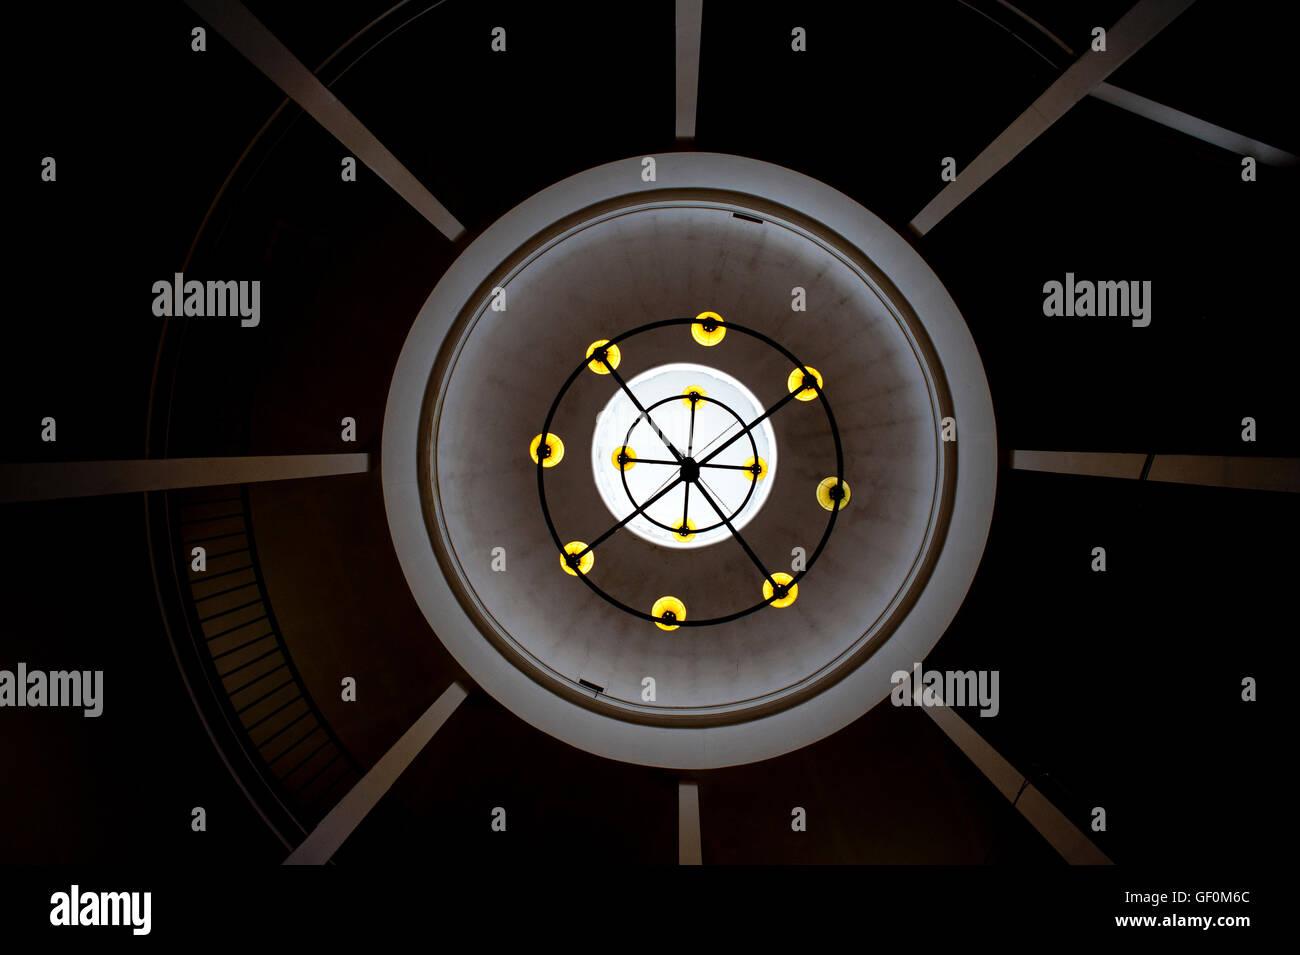 Abstract light fixture in Cork Gaol, Cork, Ireland. - Stock Image